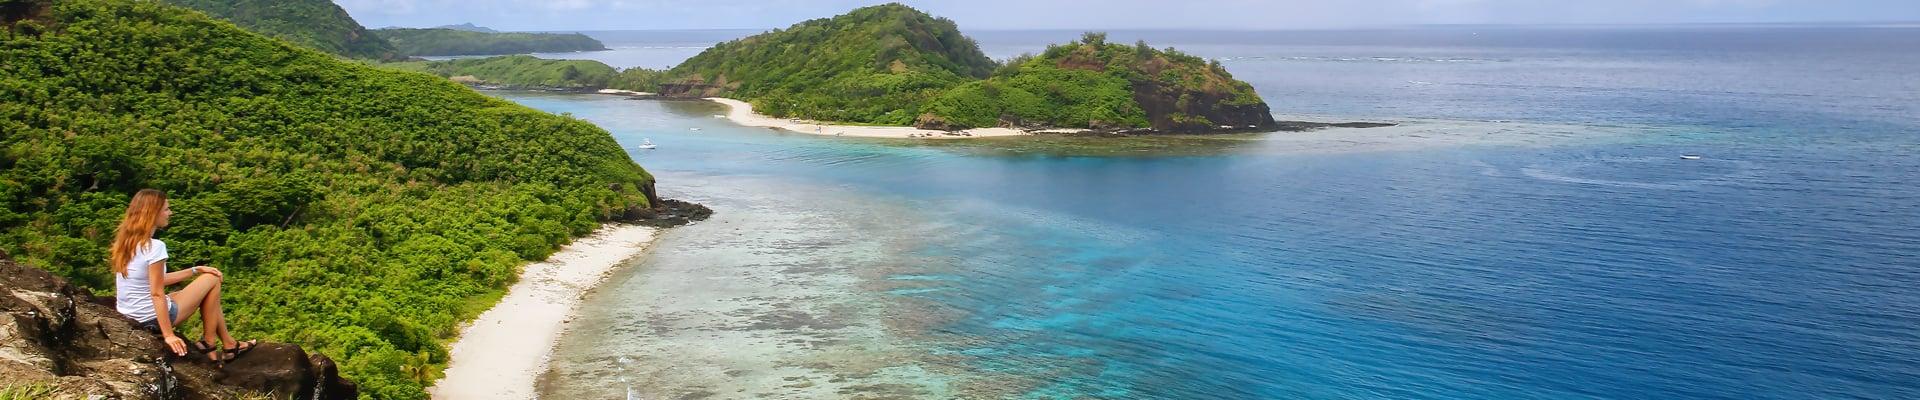 Drawaqa Island in Fiji